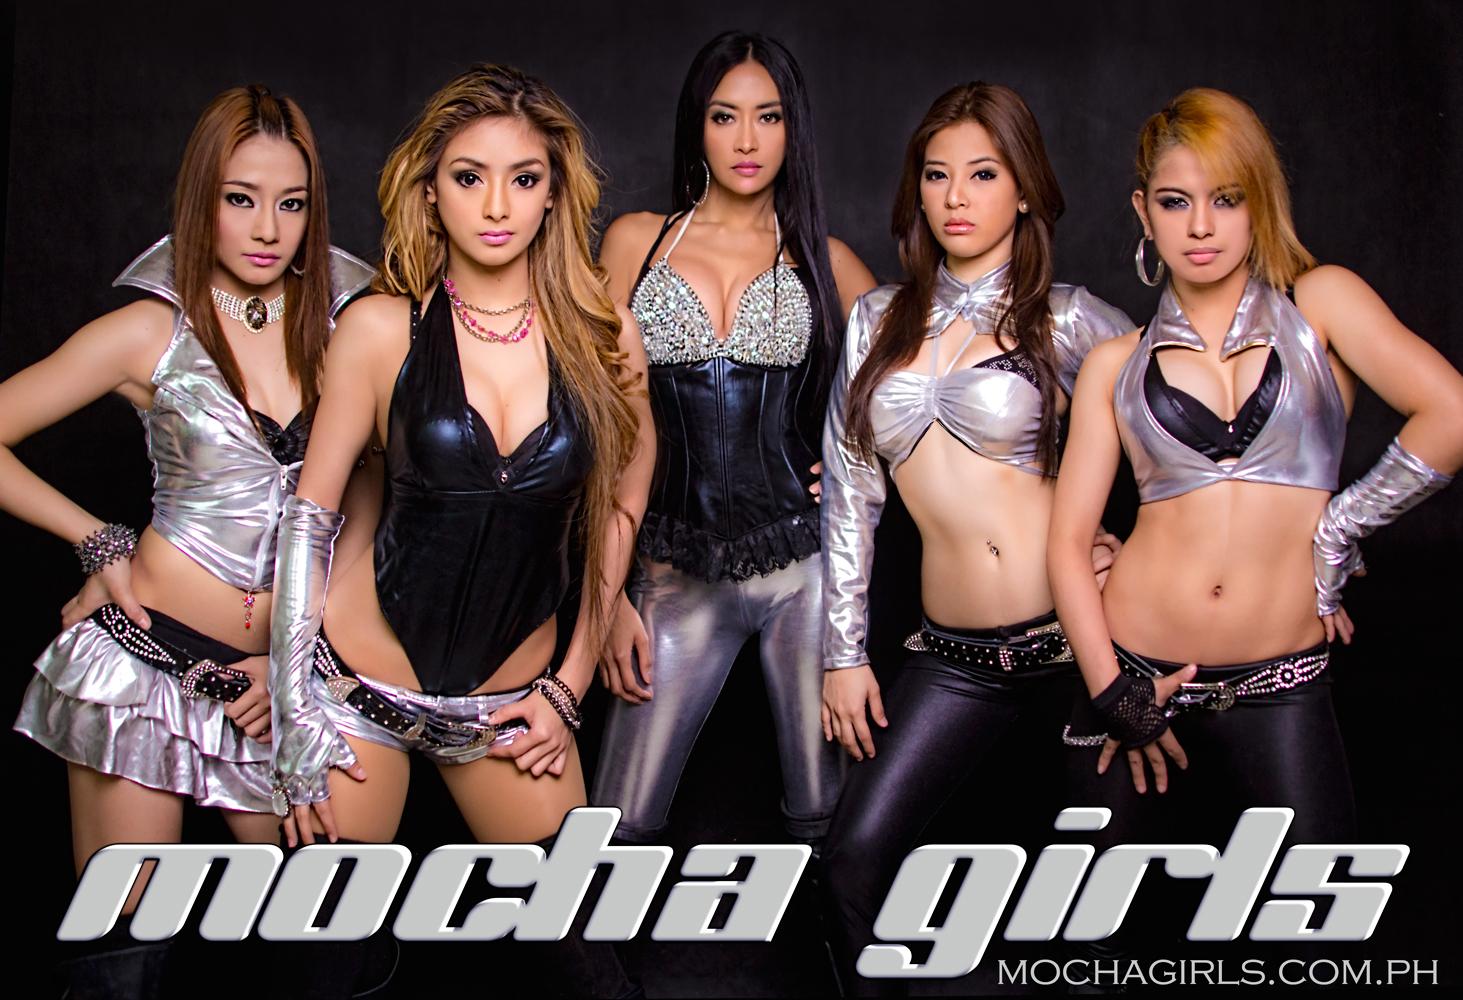 Mocha girls